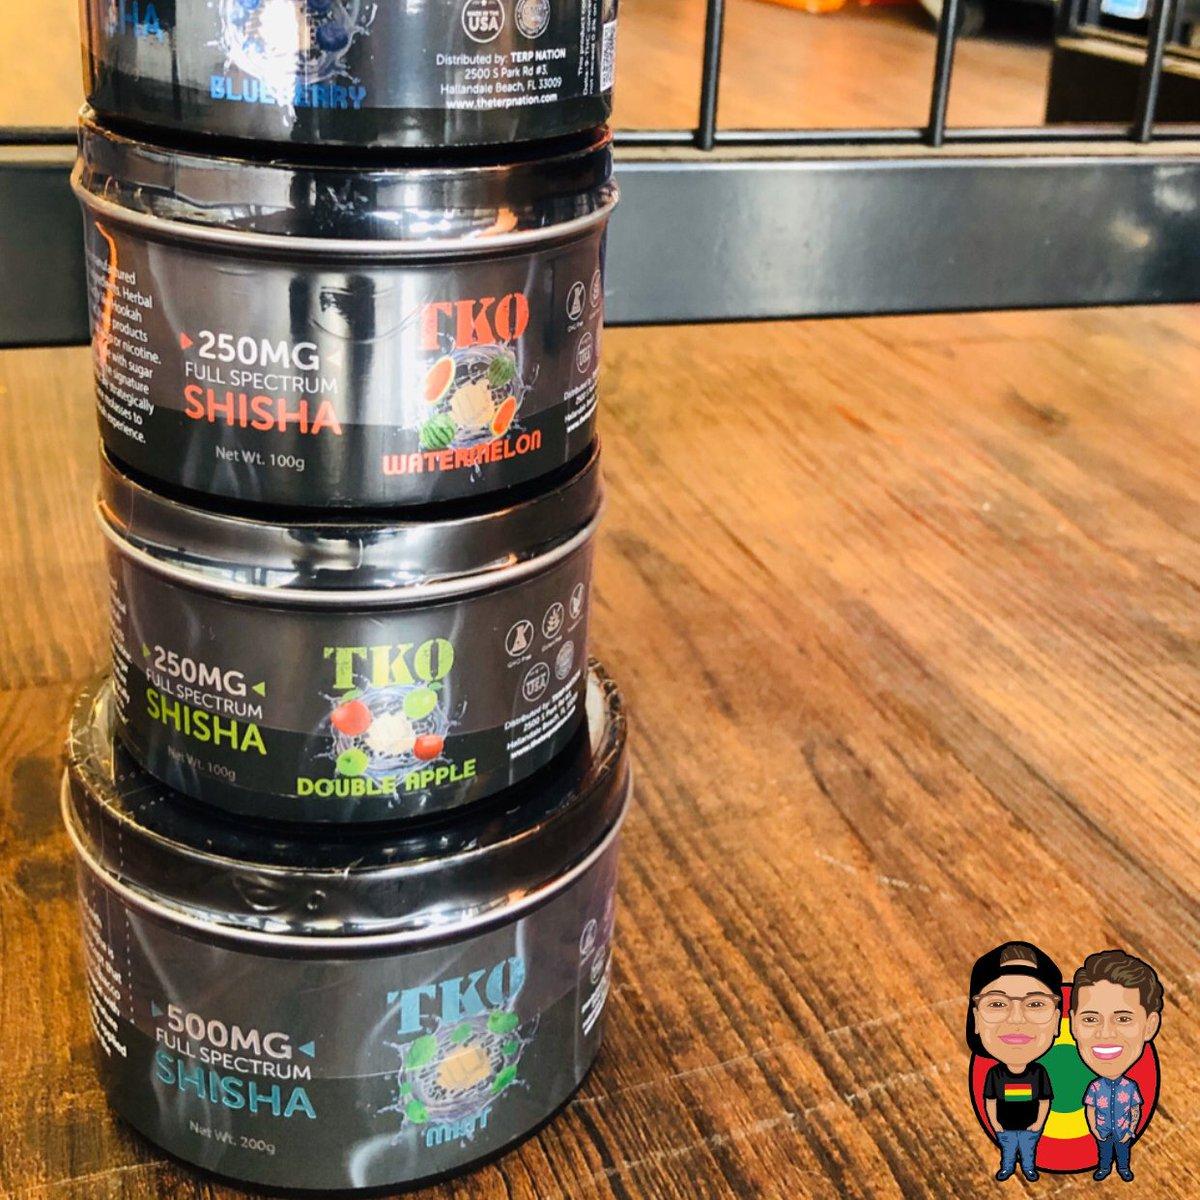 Get the ultimate relaxation with our CBD shisha! Smoke it with your new hookah! . . #layalcafe #homiezsmokeshop #smoke #hookahlounge #smoke #shisha #herbalshisha #cbd #cbdforanxiety #social #socialdistancing #houstonevents #houstonmarkets <br>http://pic.twitter.com/GEAMMjhxbp